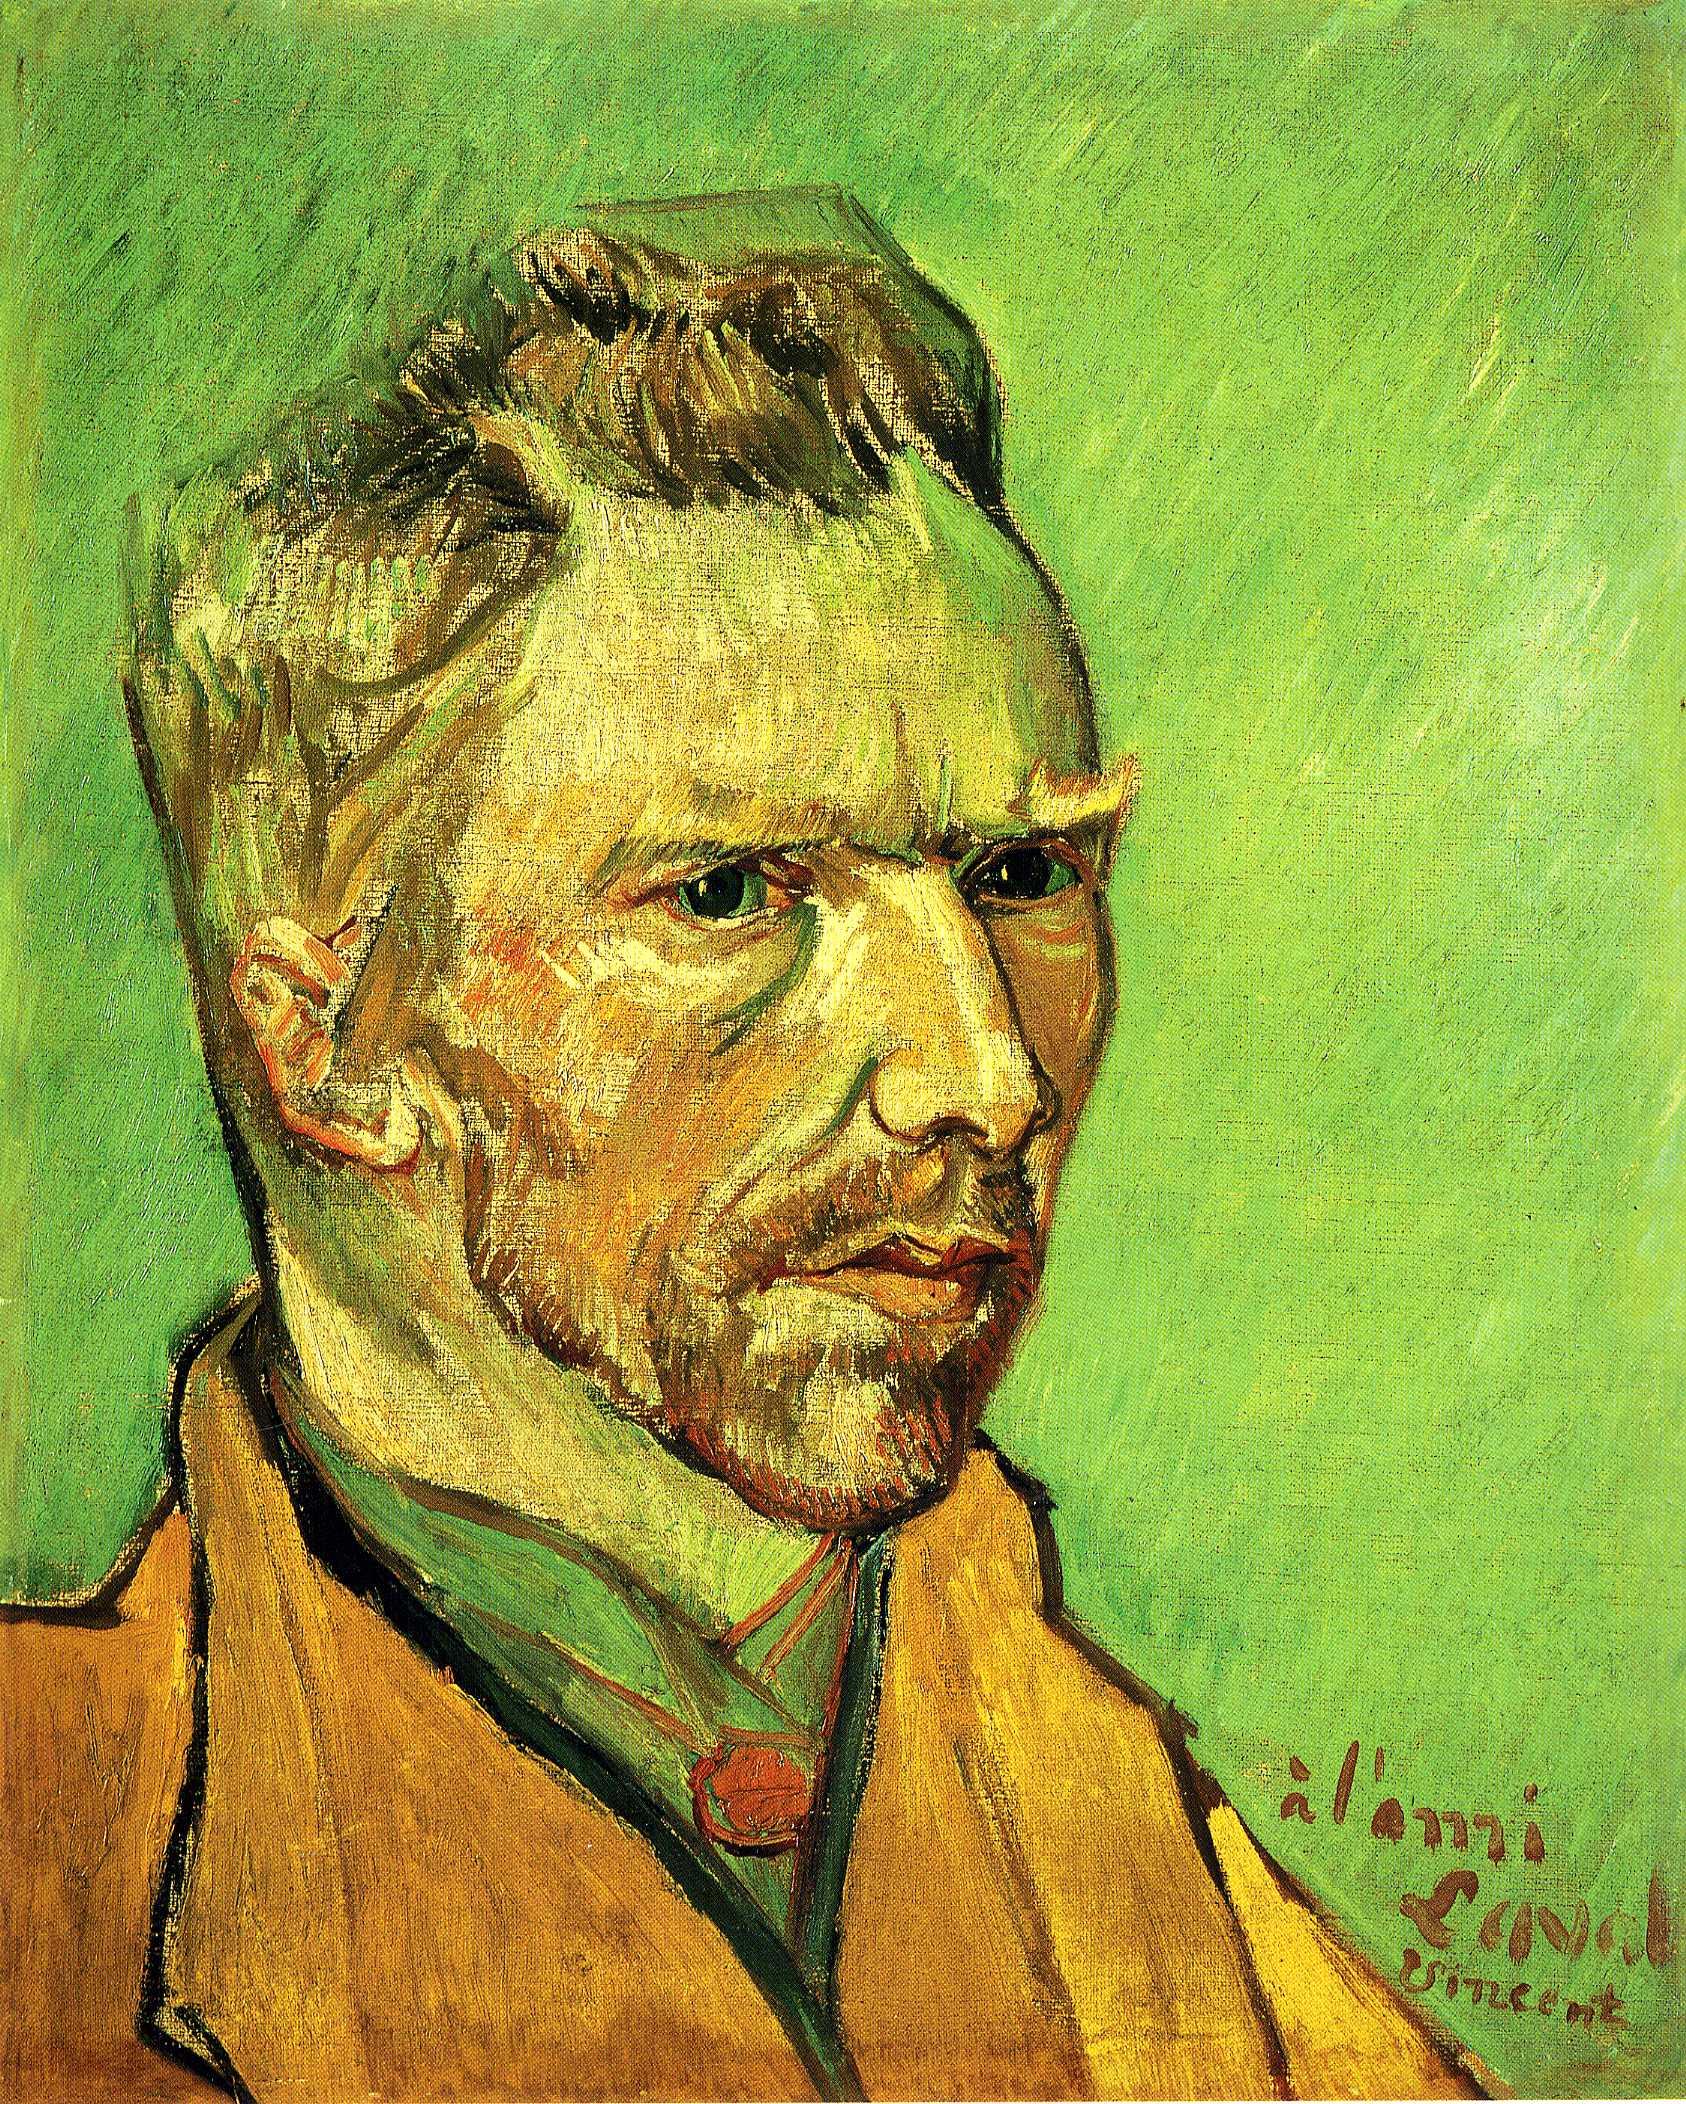 Self Portrait, 1888 - Vincent van Gogh - WikiArt.org